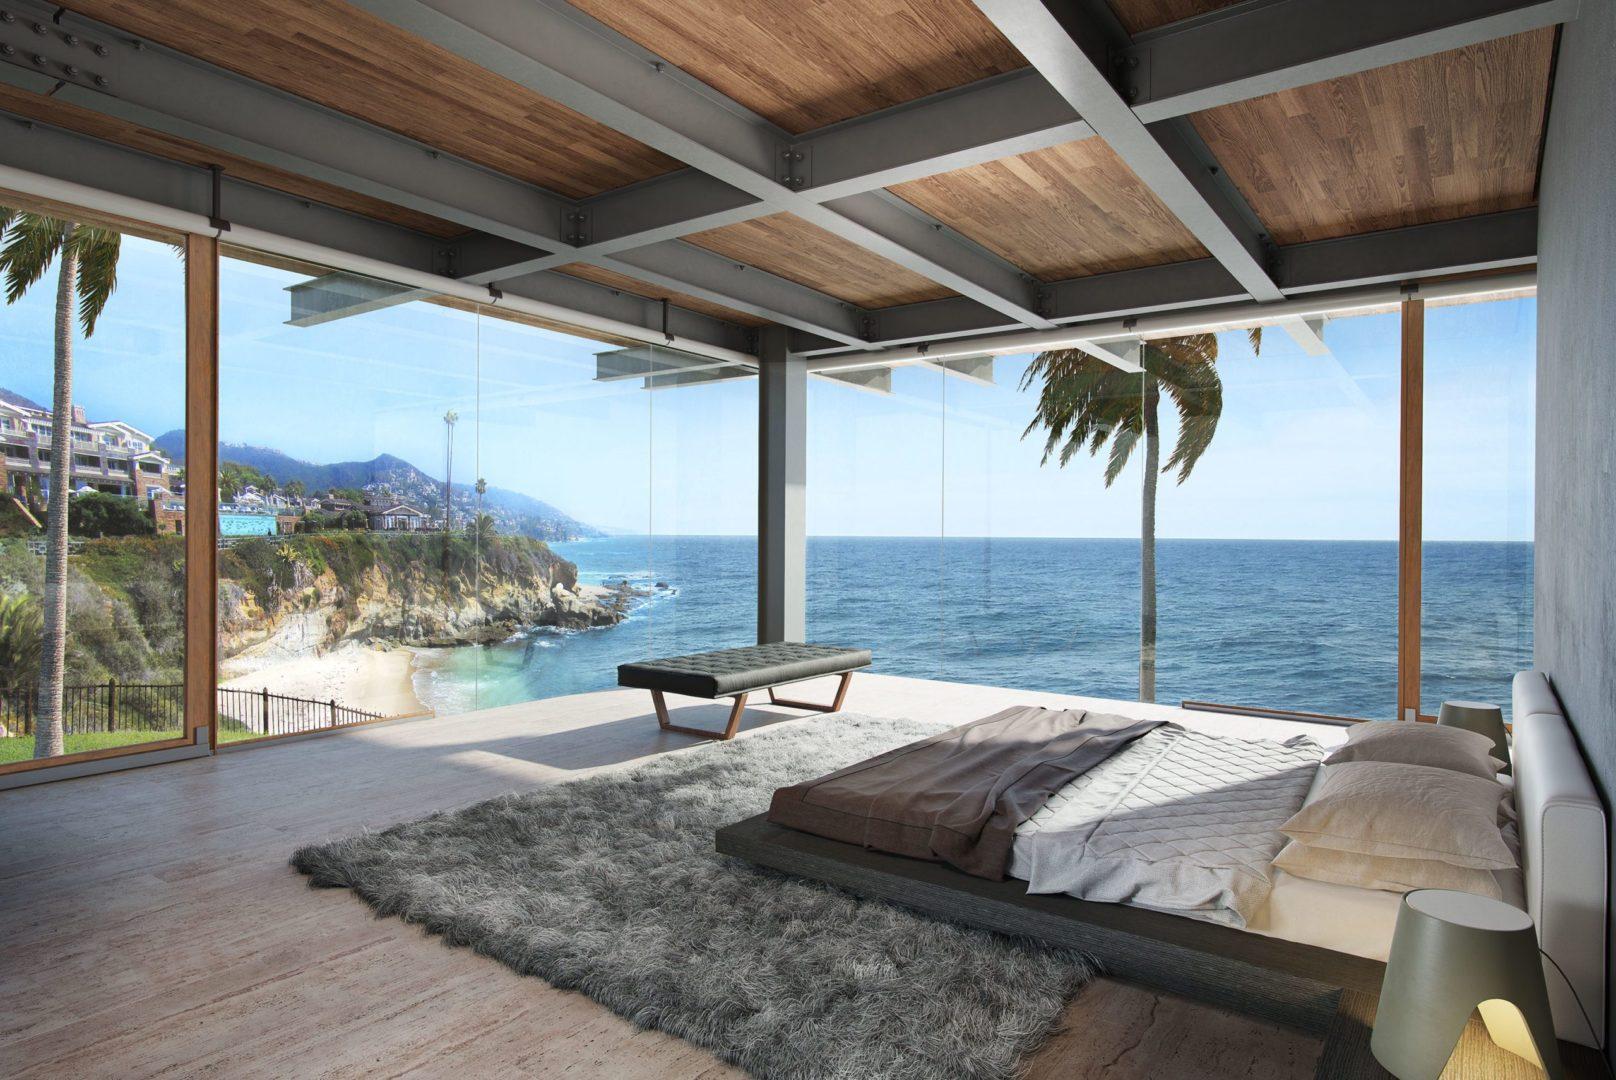 Laguna-Beach-Scene-3-1080